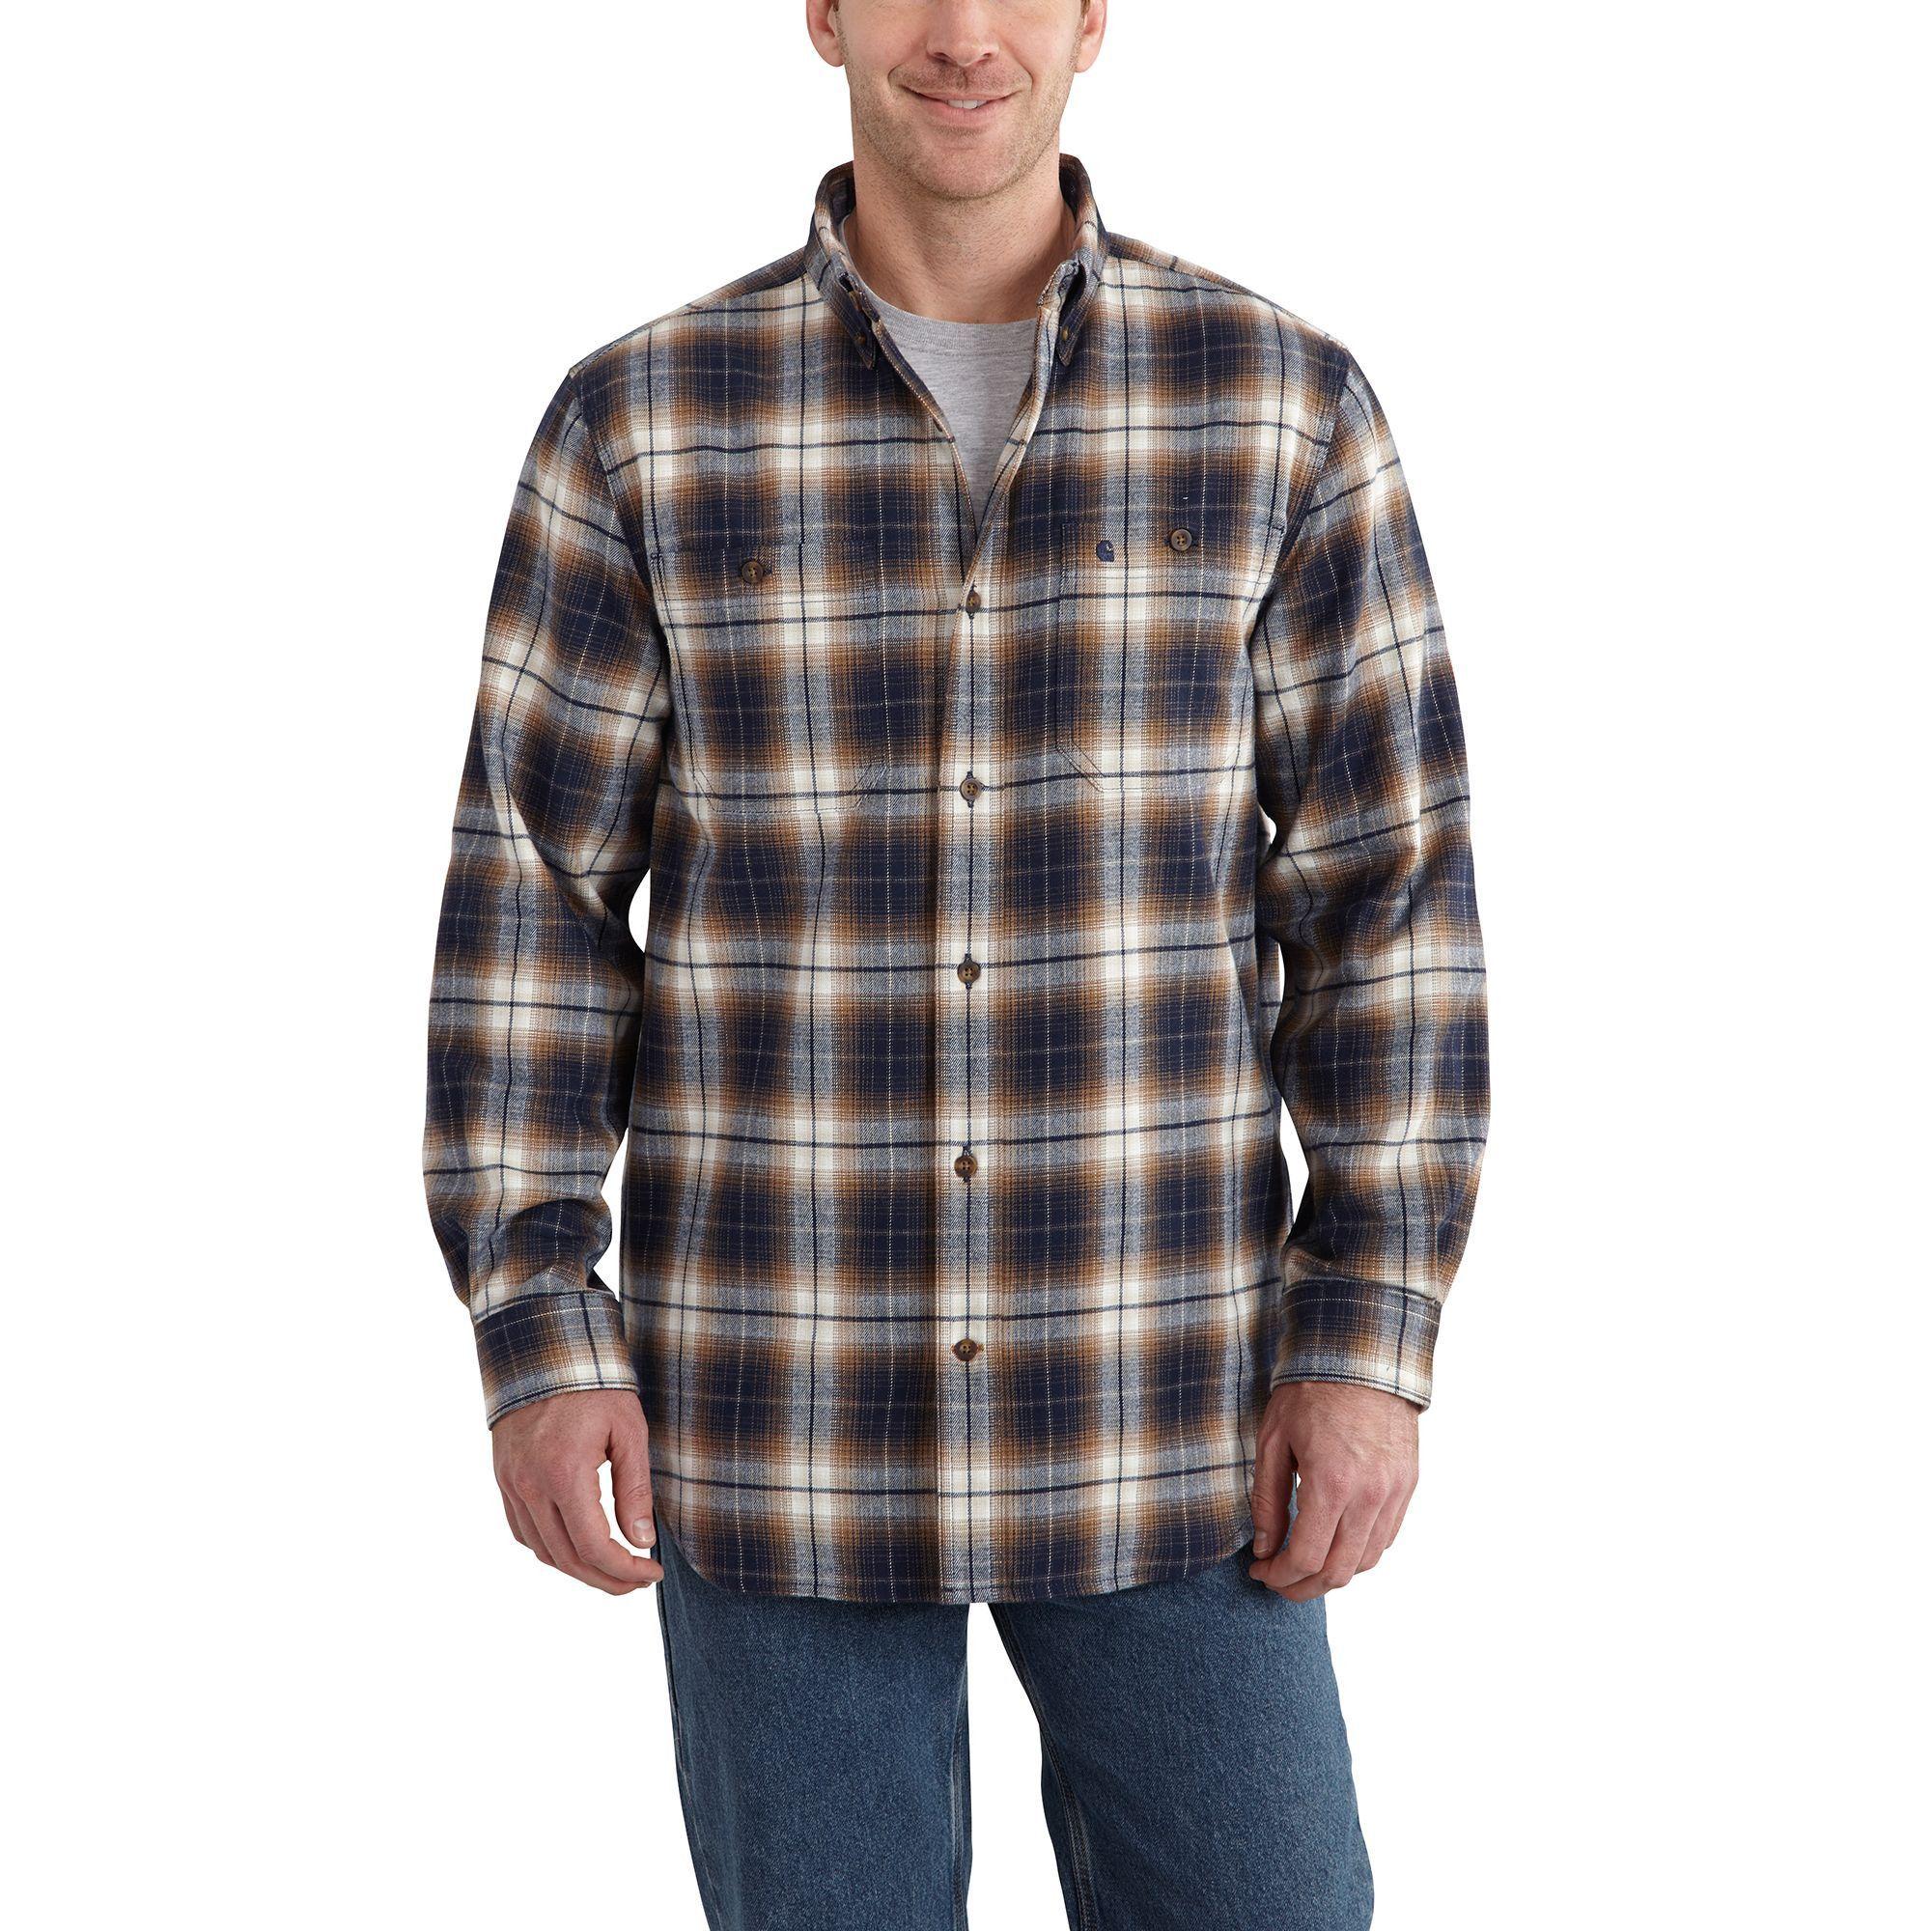 Carhartt Mens Trumbull Plaid Shirt 101295 Navy